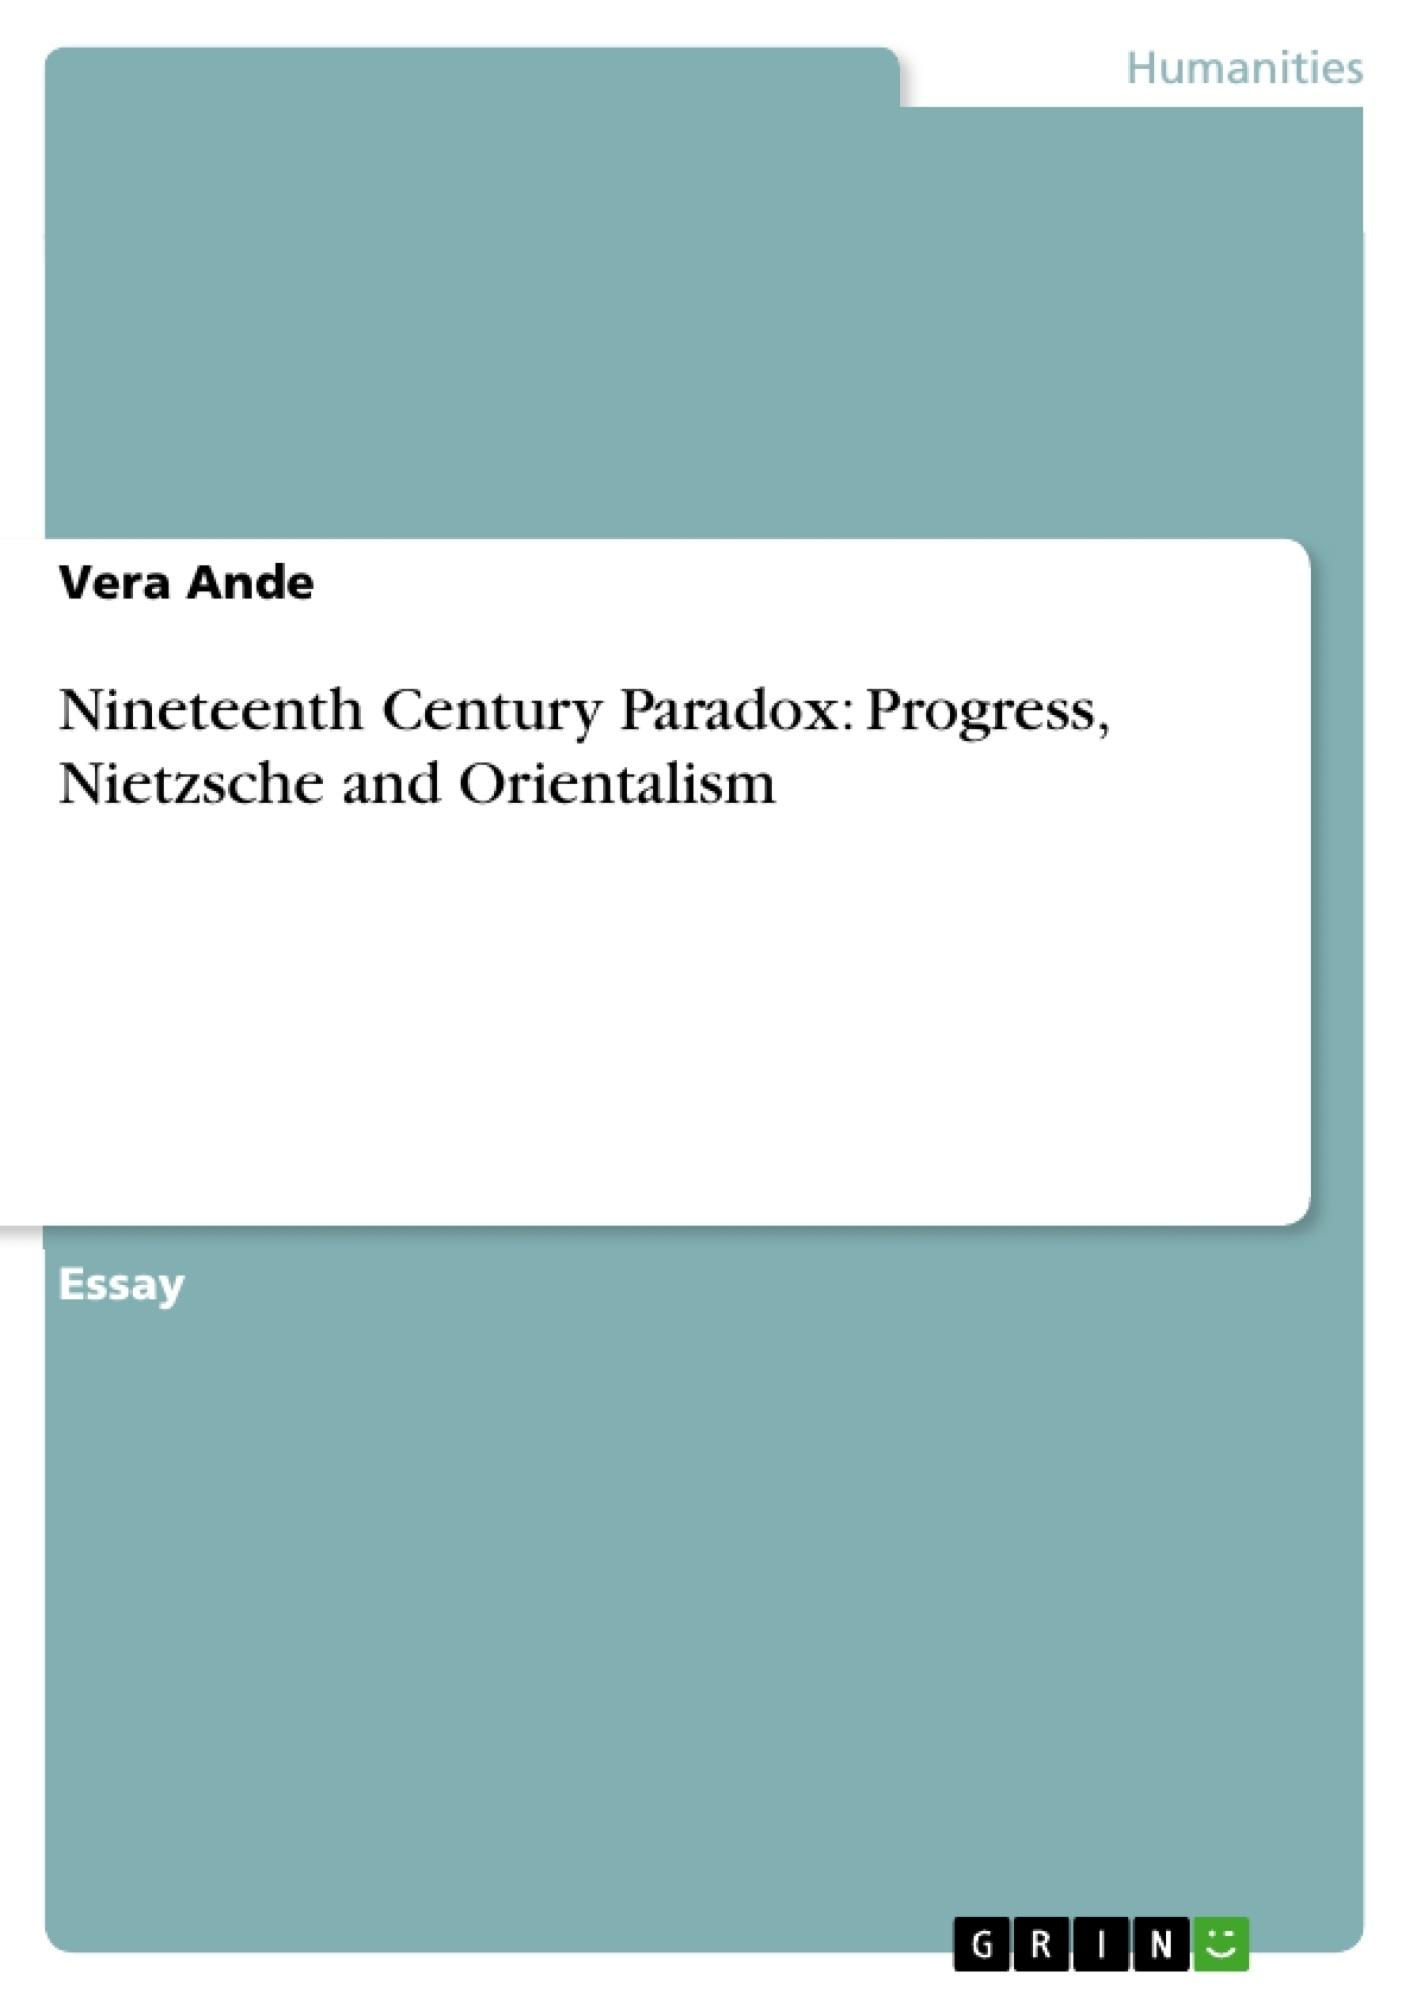 Title: Nineteenth Century Paradox: Progress, Nietzsche and Orientalism